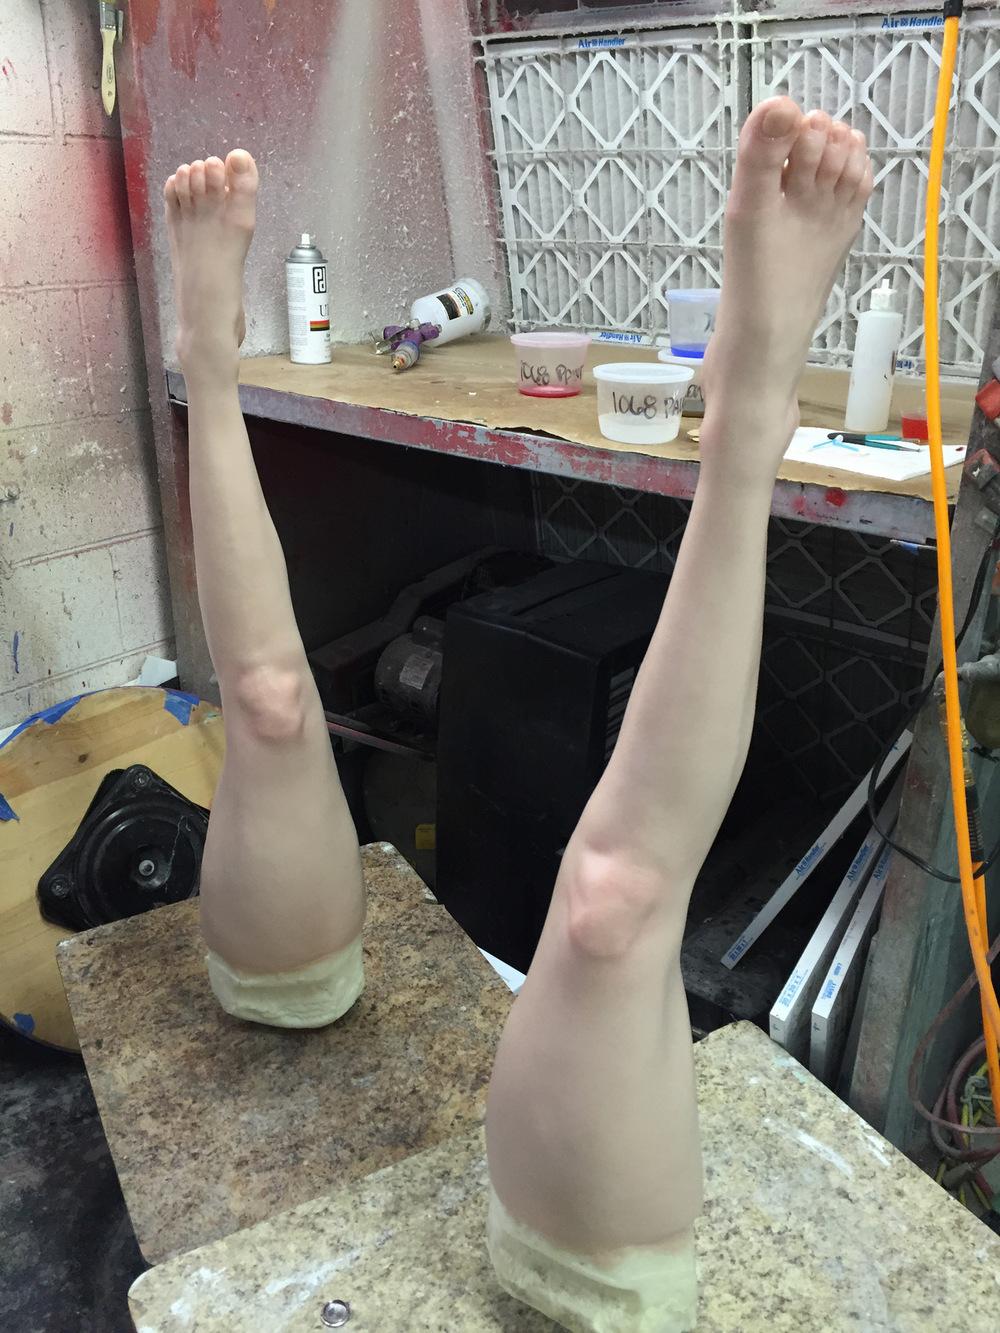 Atticus Anderson Portfolio - Life-casts of Lady Gagas legs. I conducted life cast of Lady Gagas legs on set with Brad Palmer and Maiko Chiba.